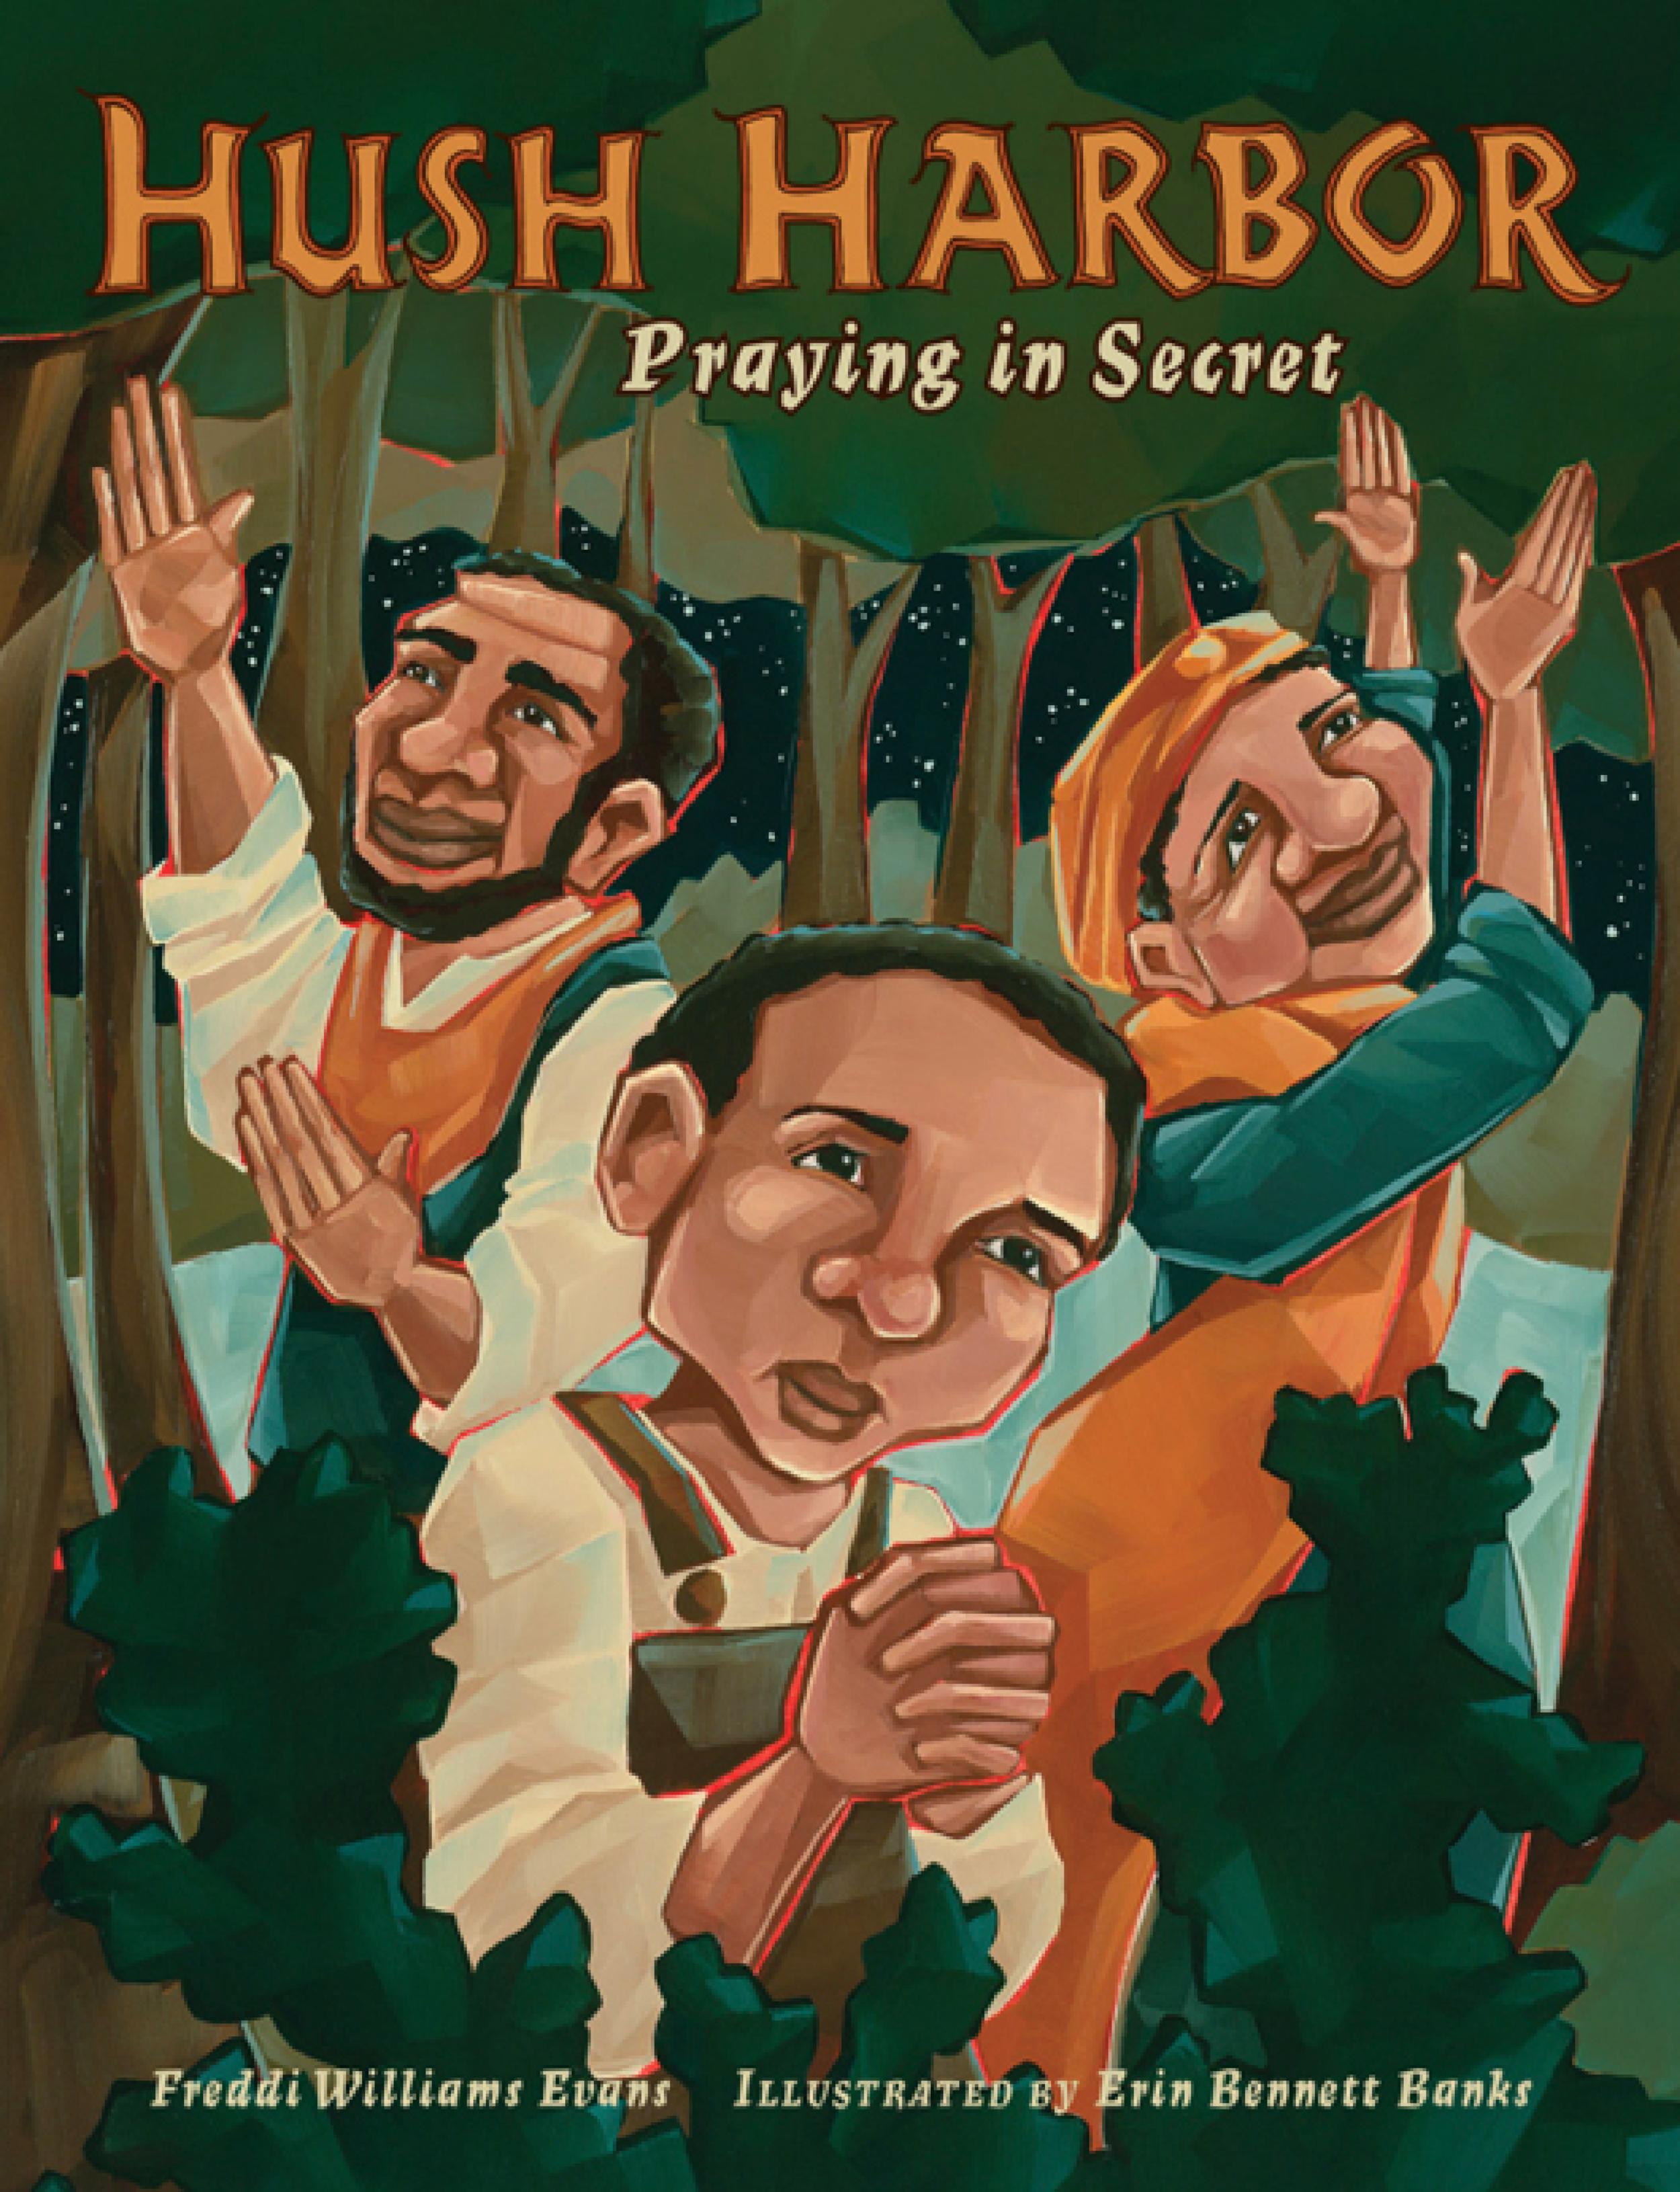 Written by : Freddi Williams Evans  Illustrated by : Erin Bennett Banks  Carolrhoda Books, 2008